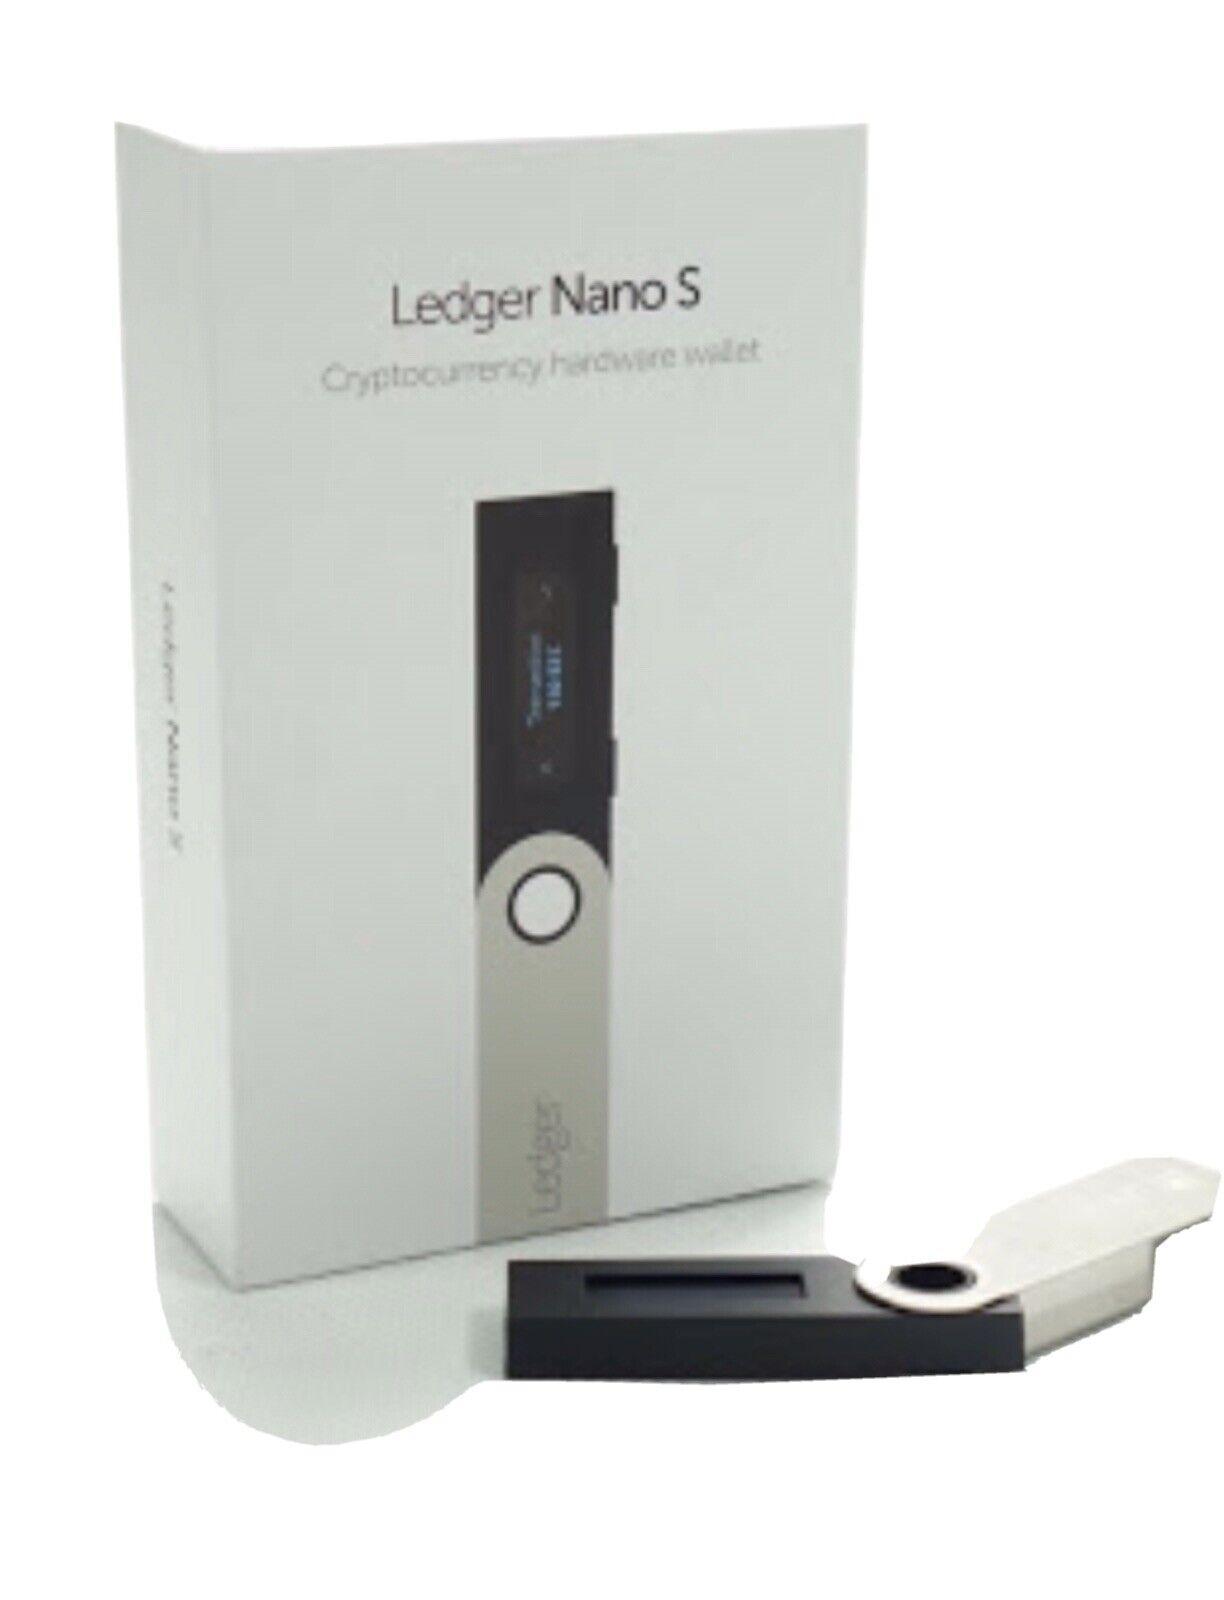 Ledger Nano S Bitcoin Ethereum Crypto Altcoin Litecoin Ripple Wallet NEW SEALED 1